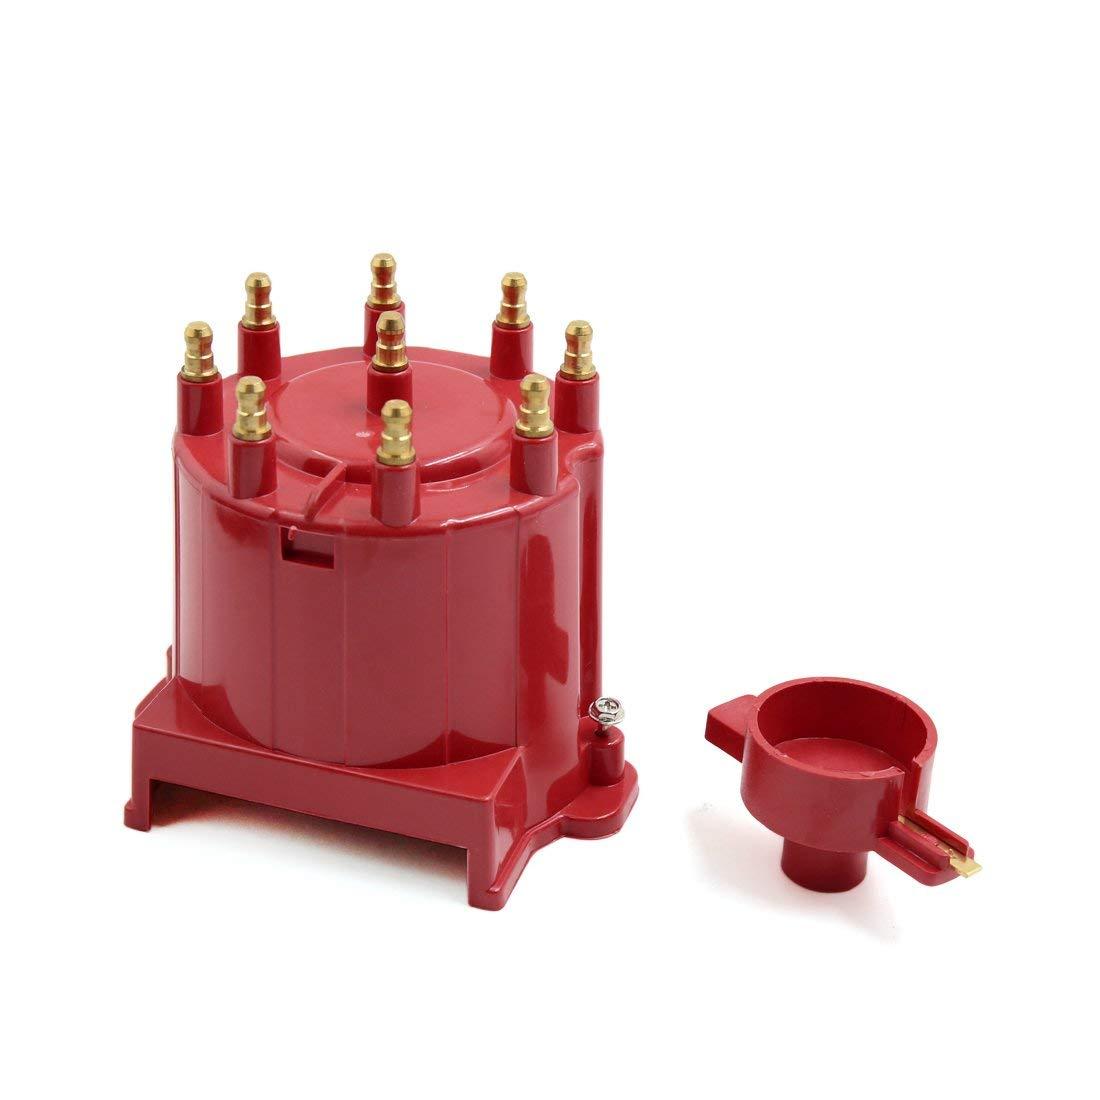 X autohaux Red 8406, tapa del distribuidor de encendido de coche y Kit de Rotor, bobina externa para C1500 C2500 C3500 GMC K1500